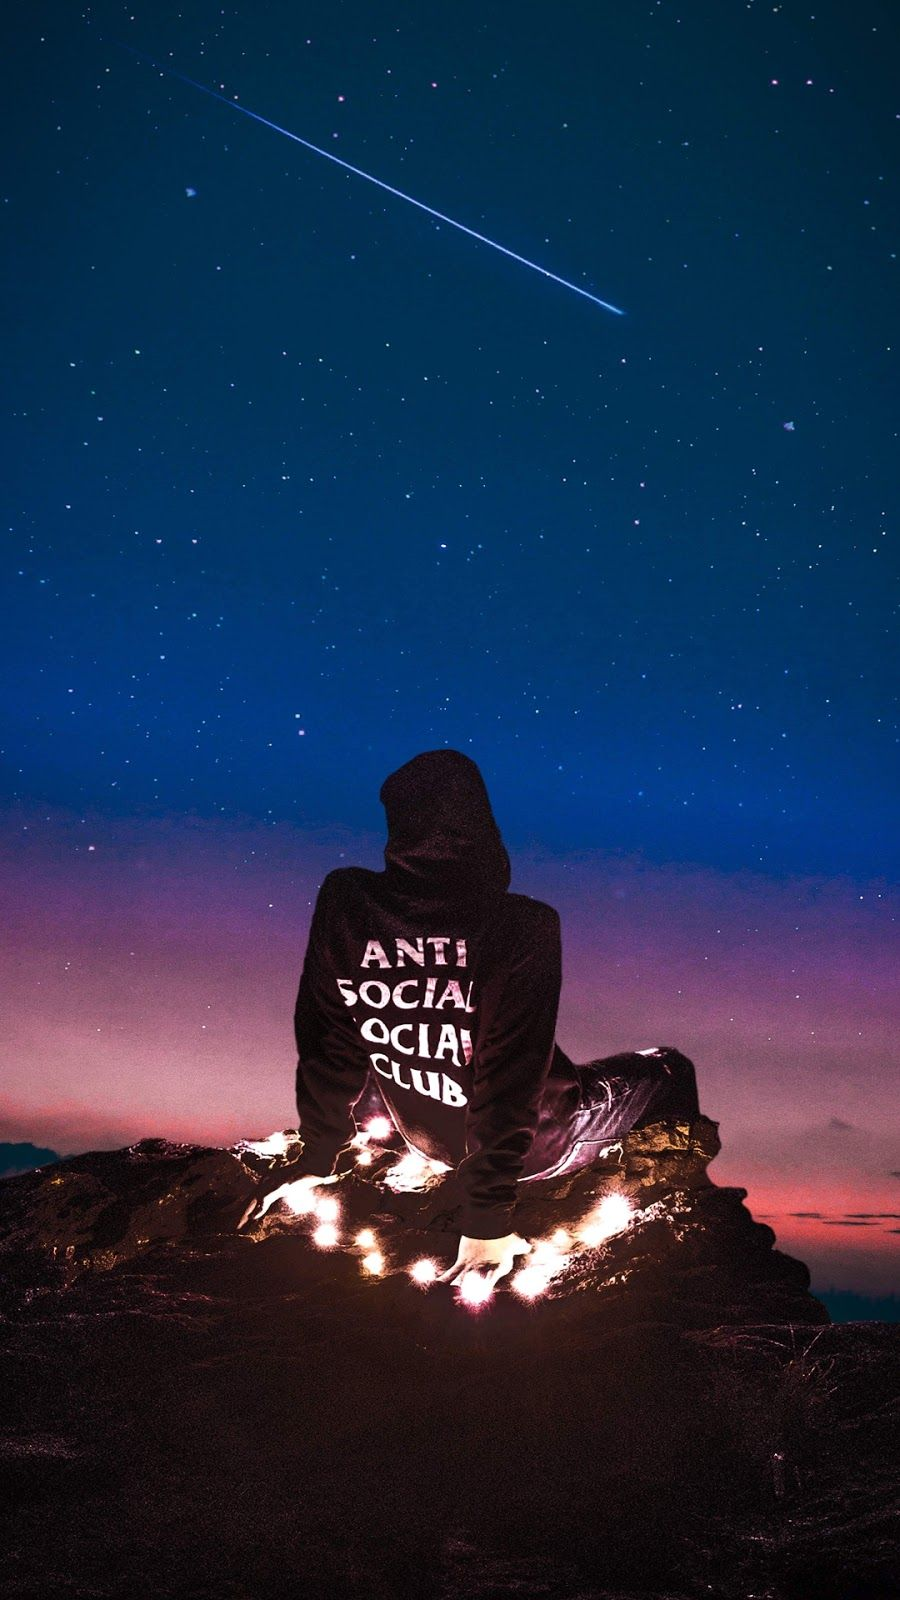 Anti Social Social Club ANTISC Fondo de pantalla